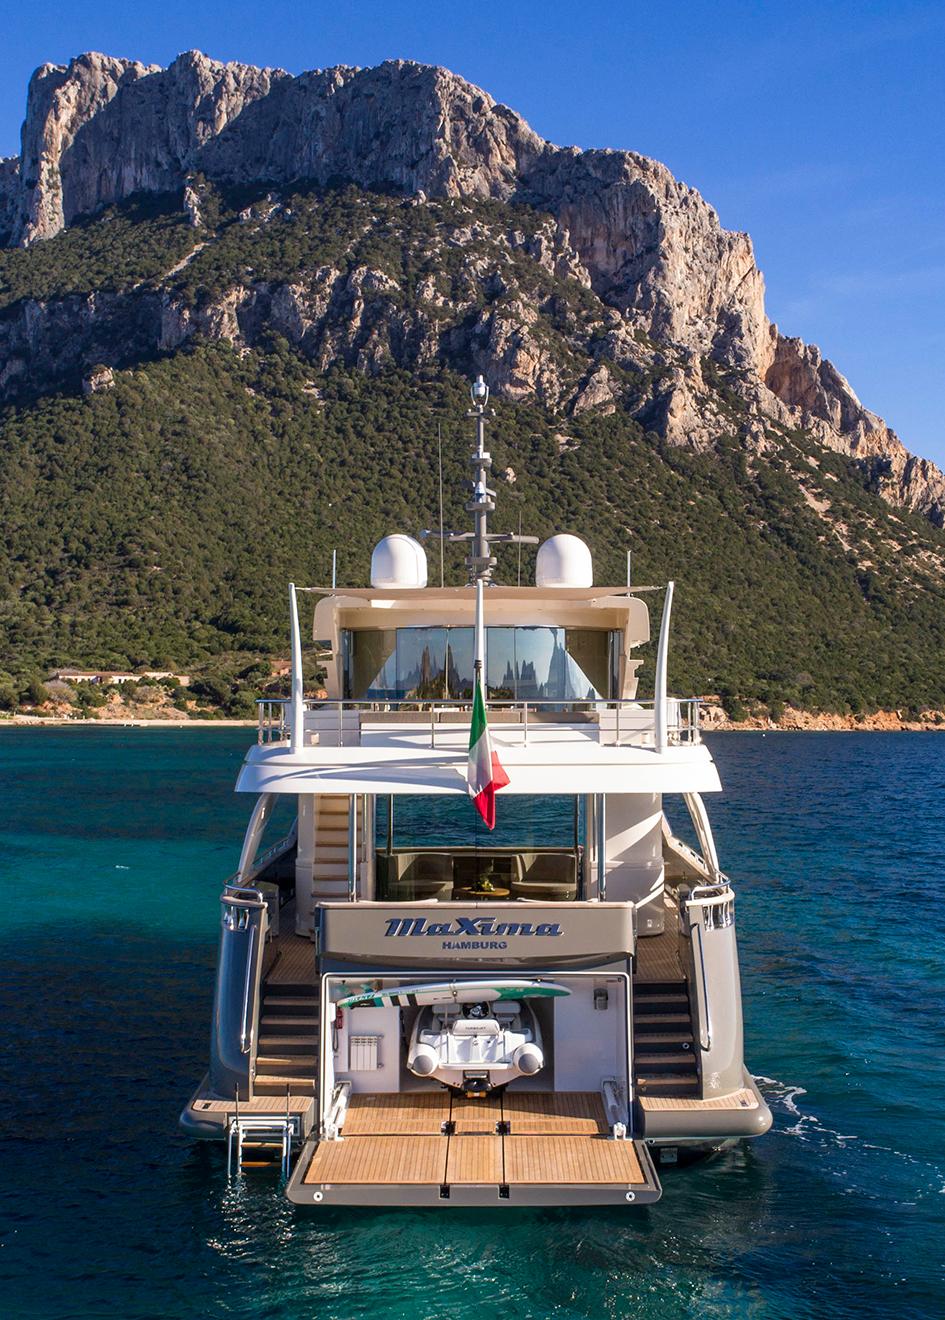 aft-view-of-the-filippetti-navetta-26-yacht-maxima